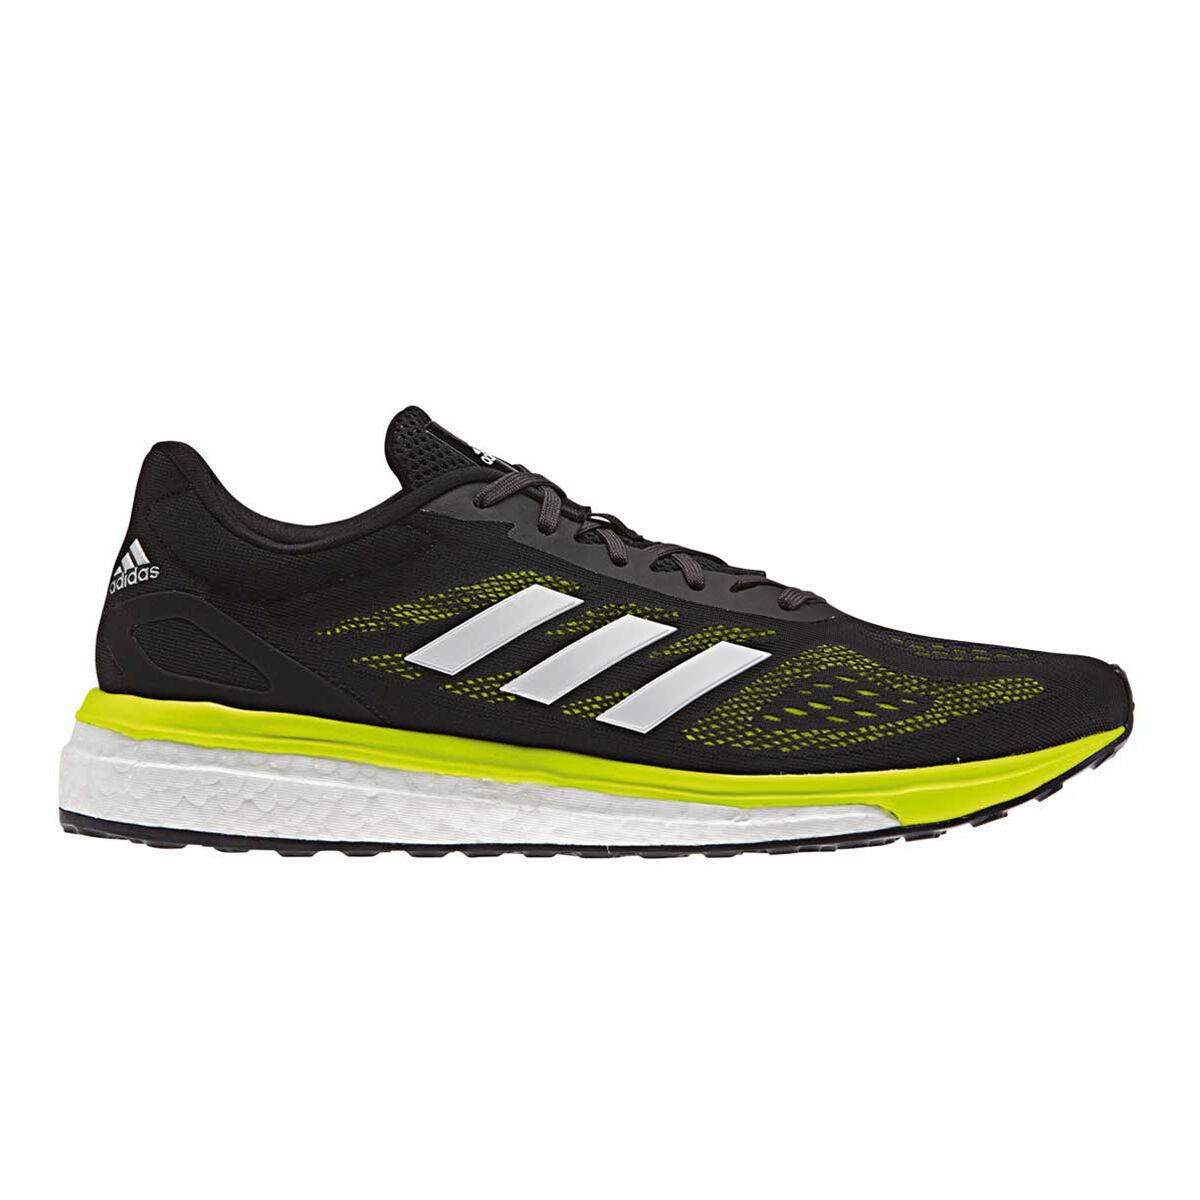 Black Response Yellow Sport Running Rebel Shoes Adidas Lt Us 7 Mens 4nFfxwqxX